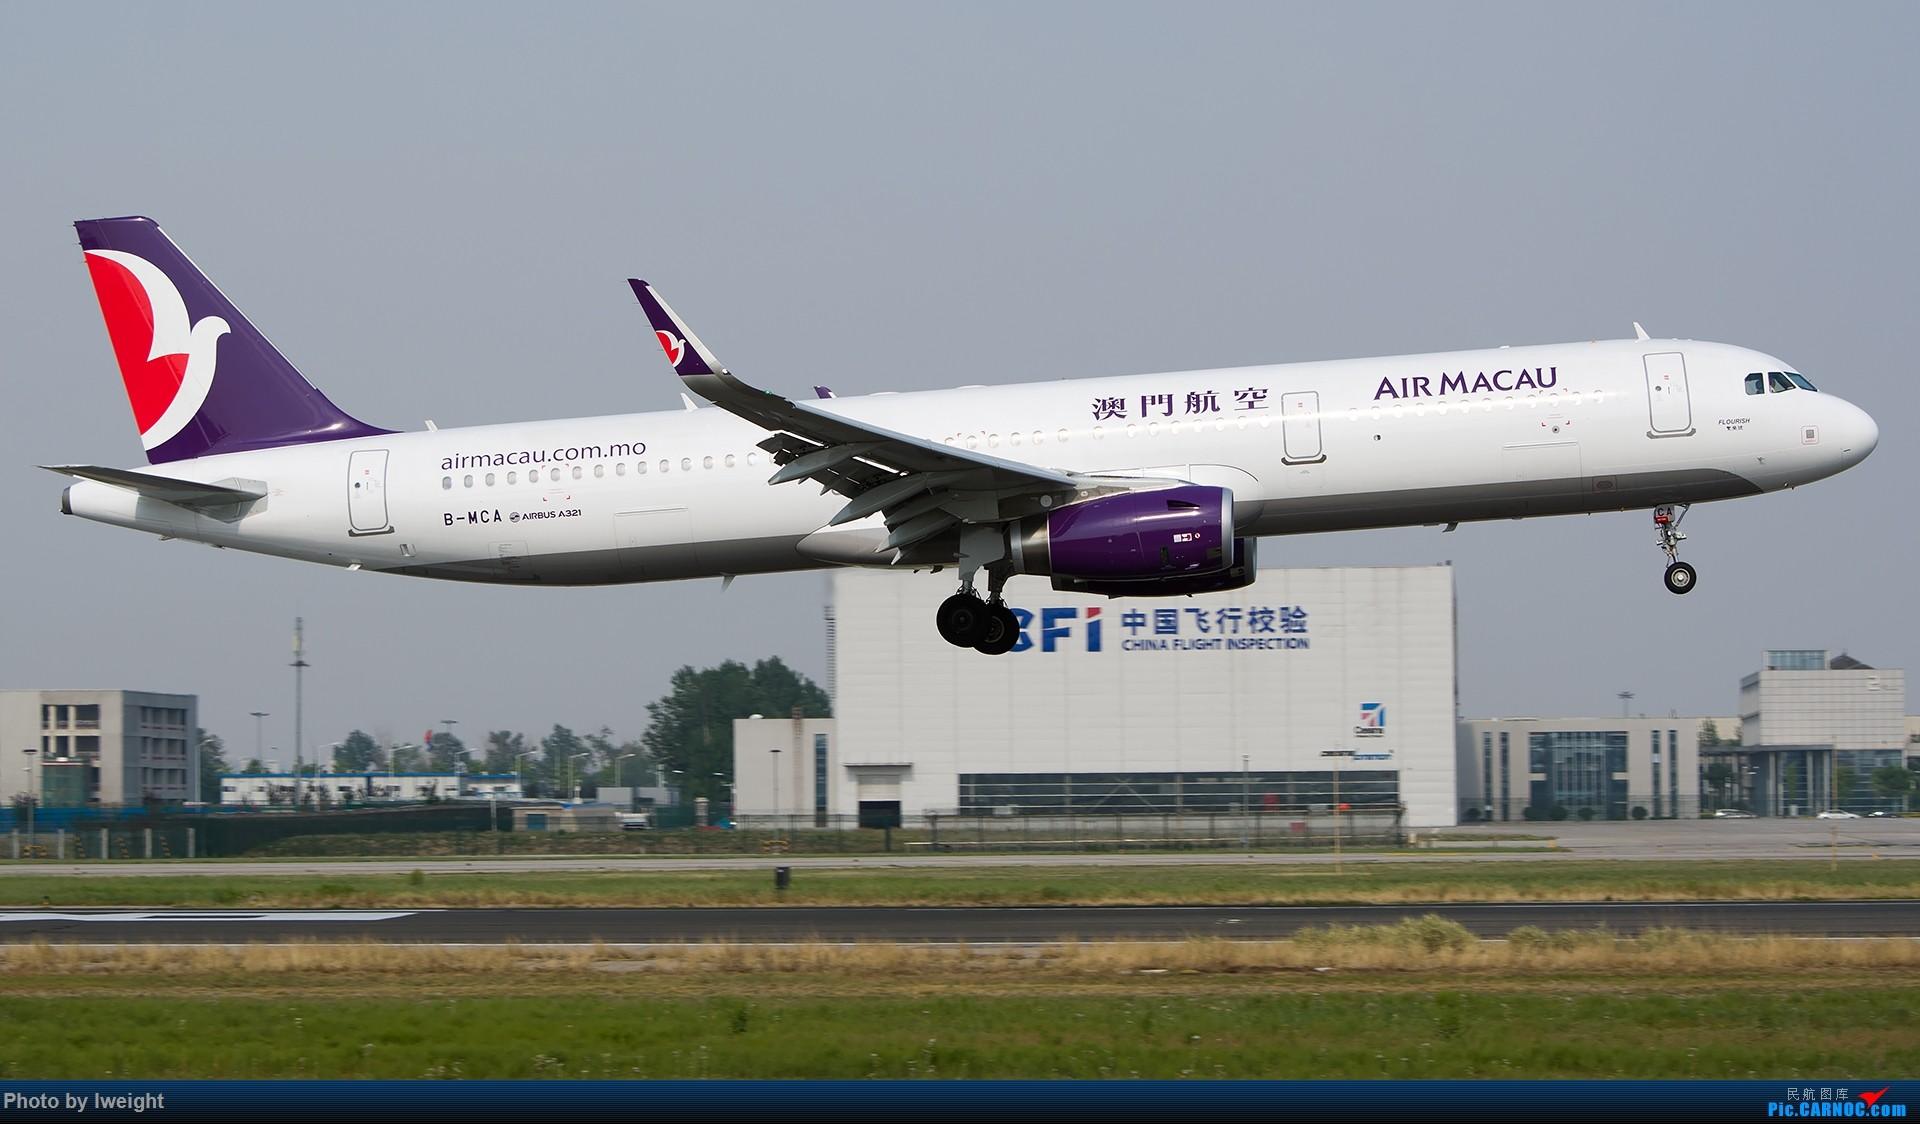 Re:[原创]周末帝都霾天拍机,凑合看看吧【2015-5-23】 AIRBUS A321-200 B-MCA 中国北京首都国际机场